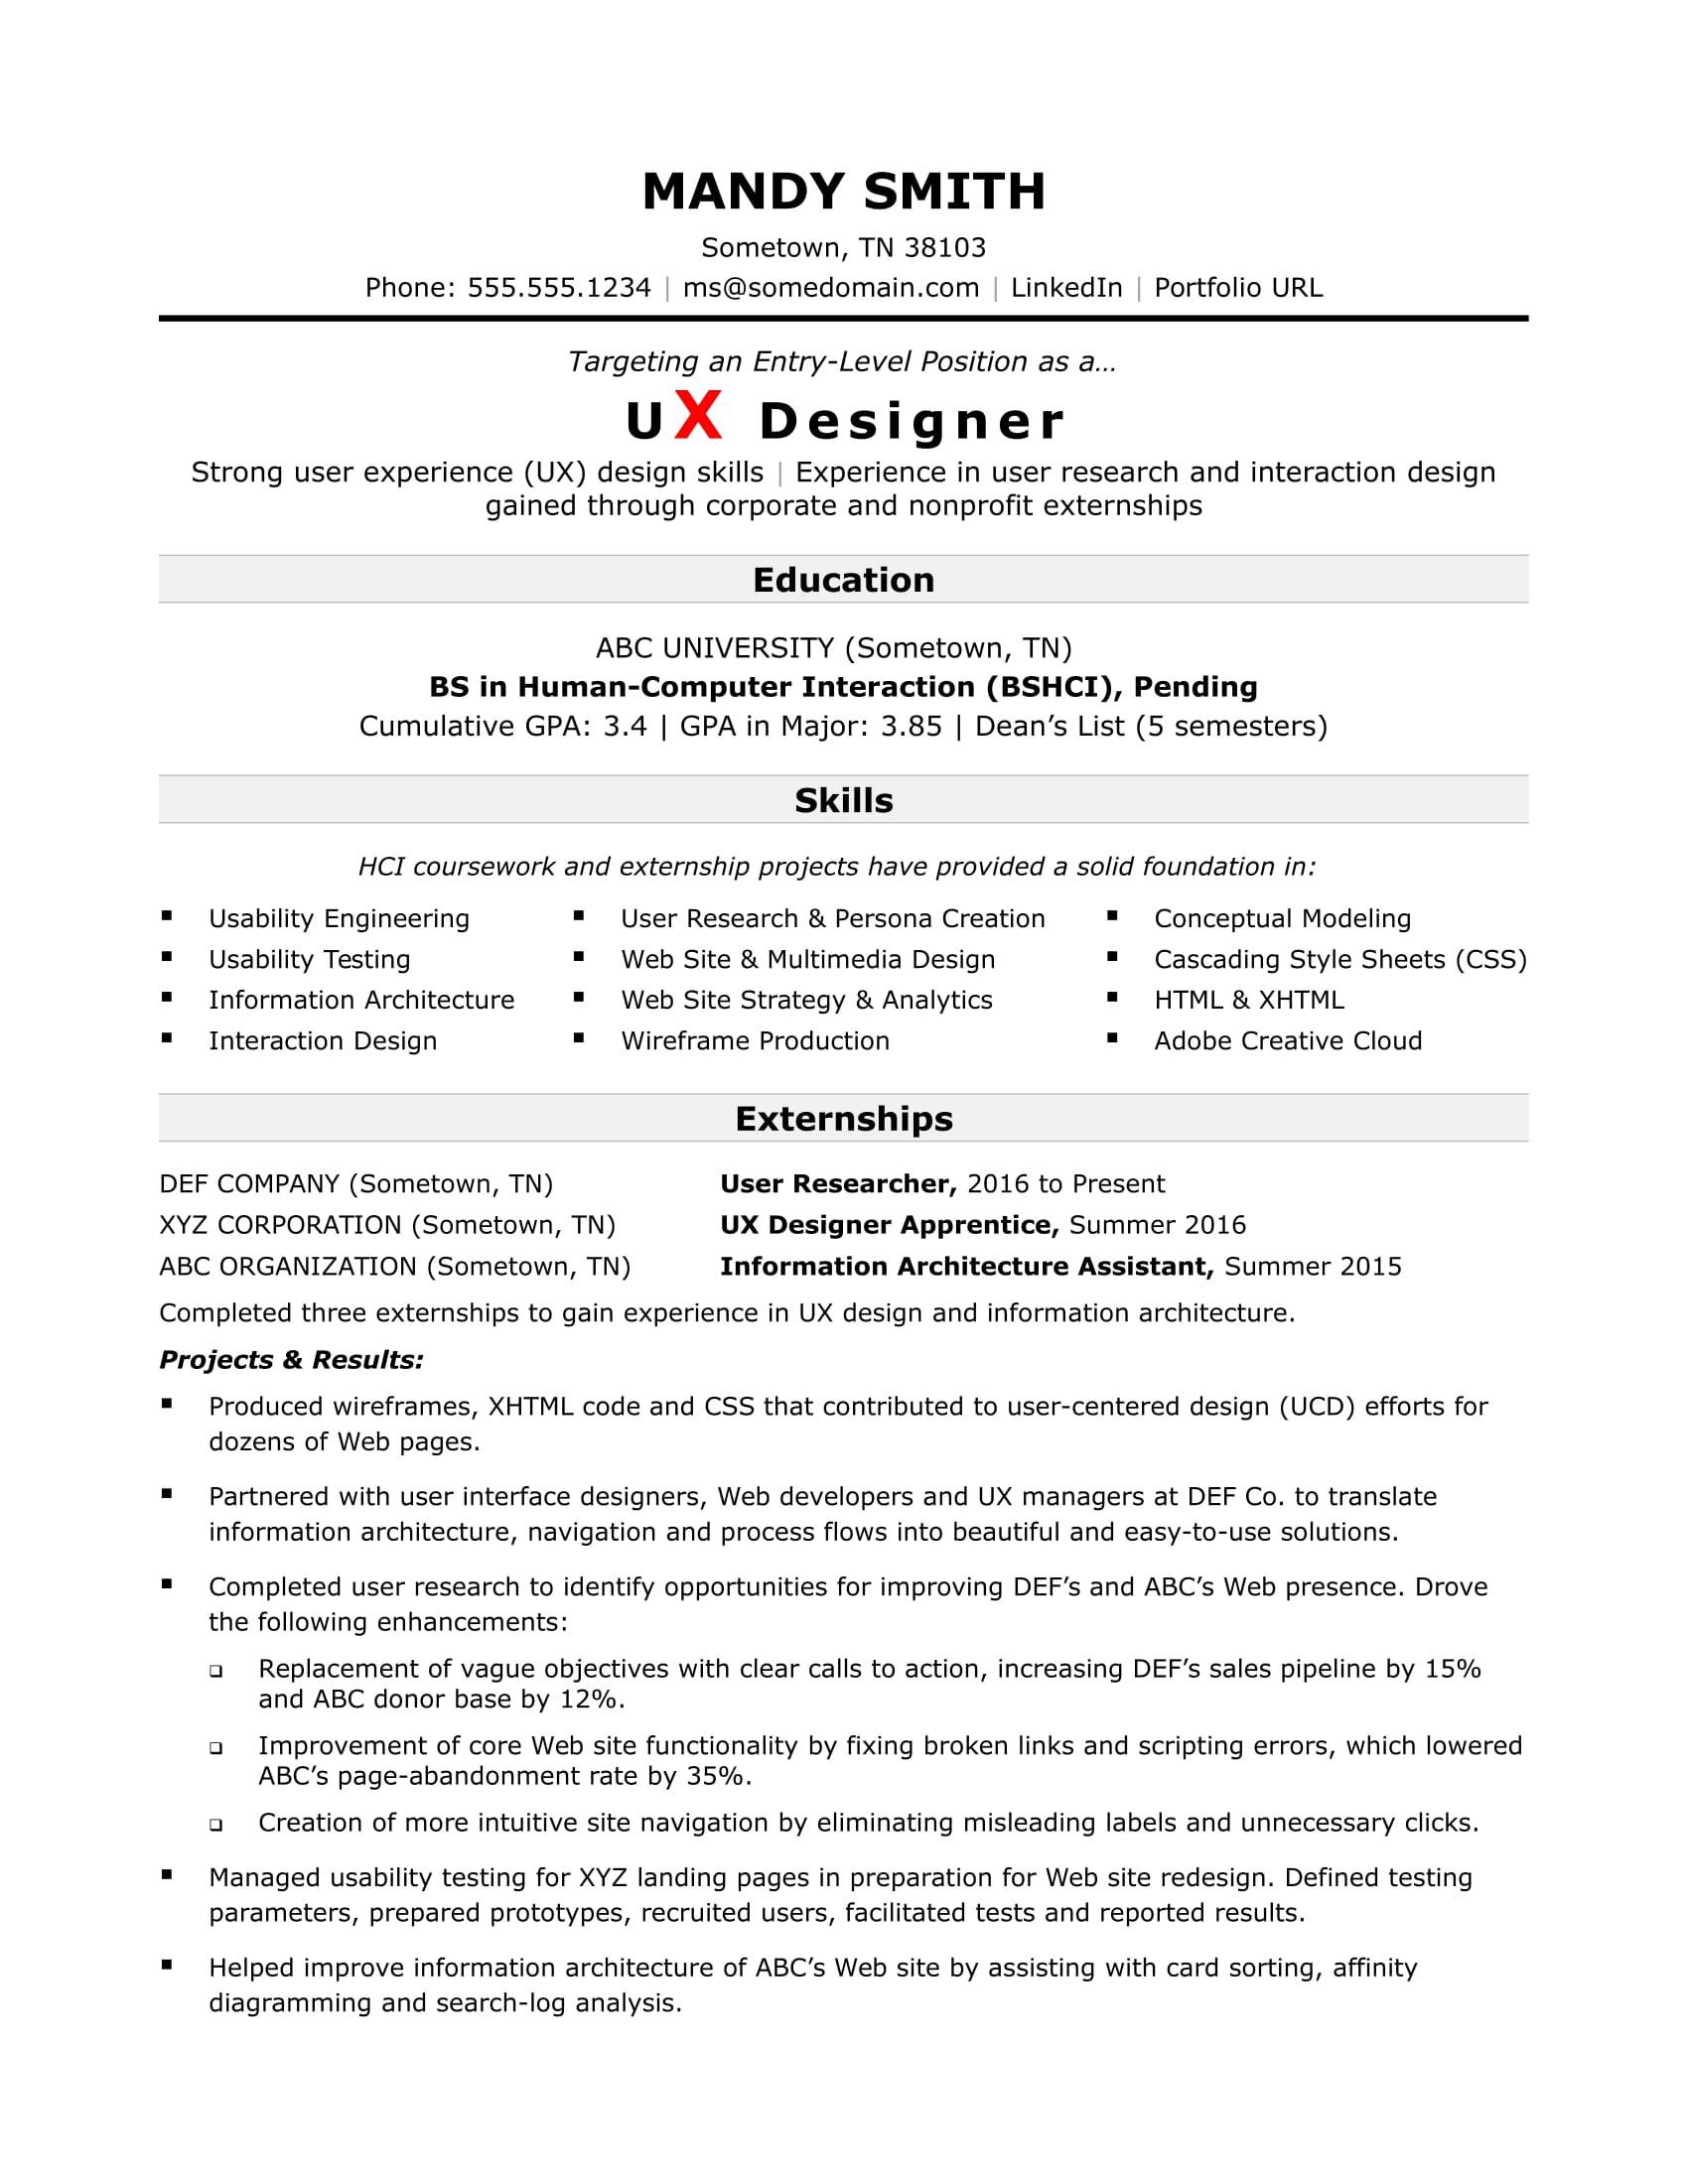 Sample Resume after Career Break India Sample Resume for An Entry-level Ux Designer Monster.com